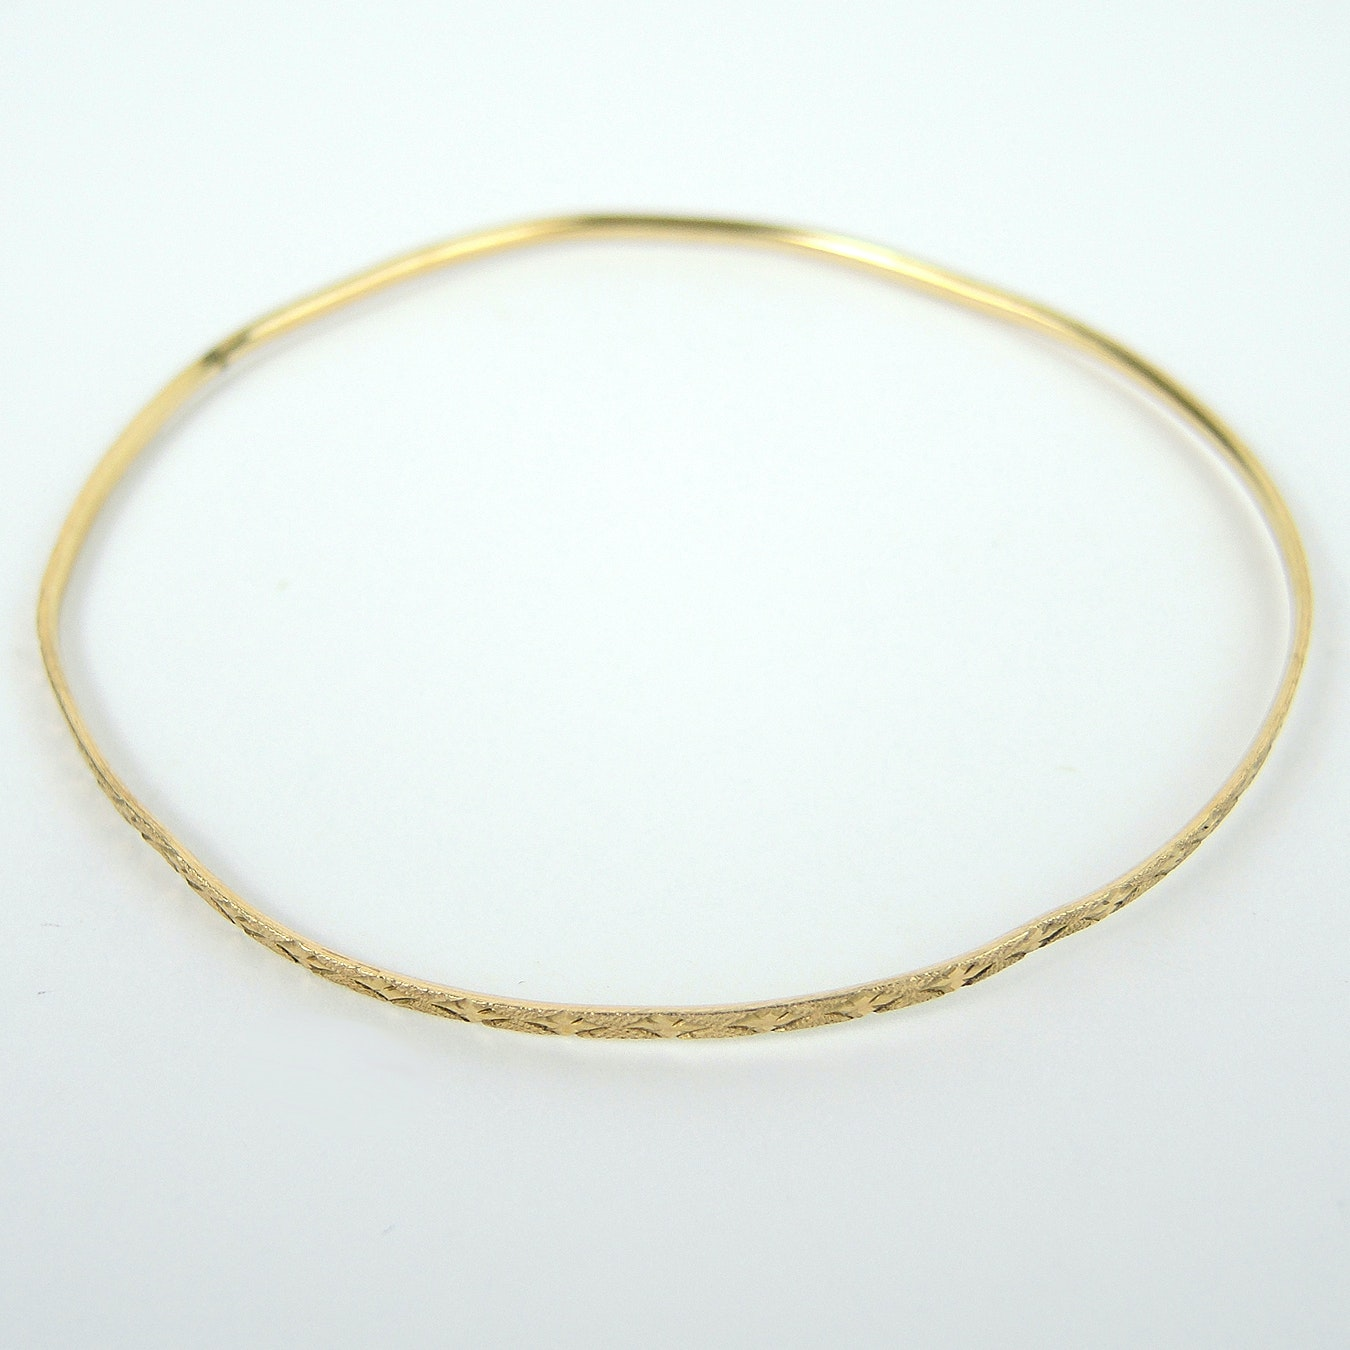 10K Yellow Gold Bangle Bracelet